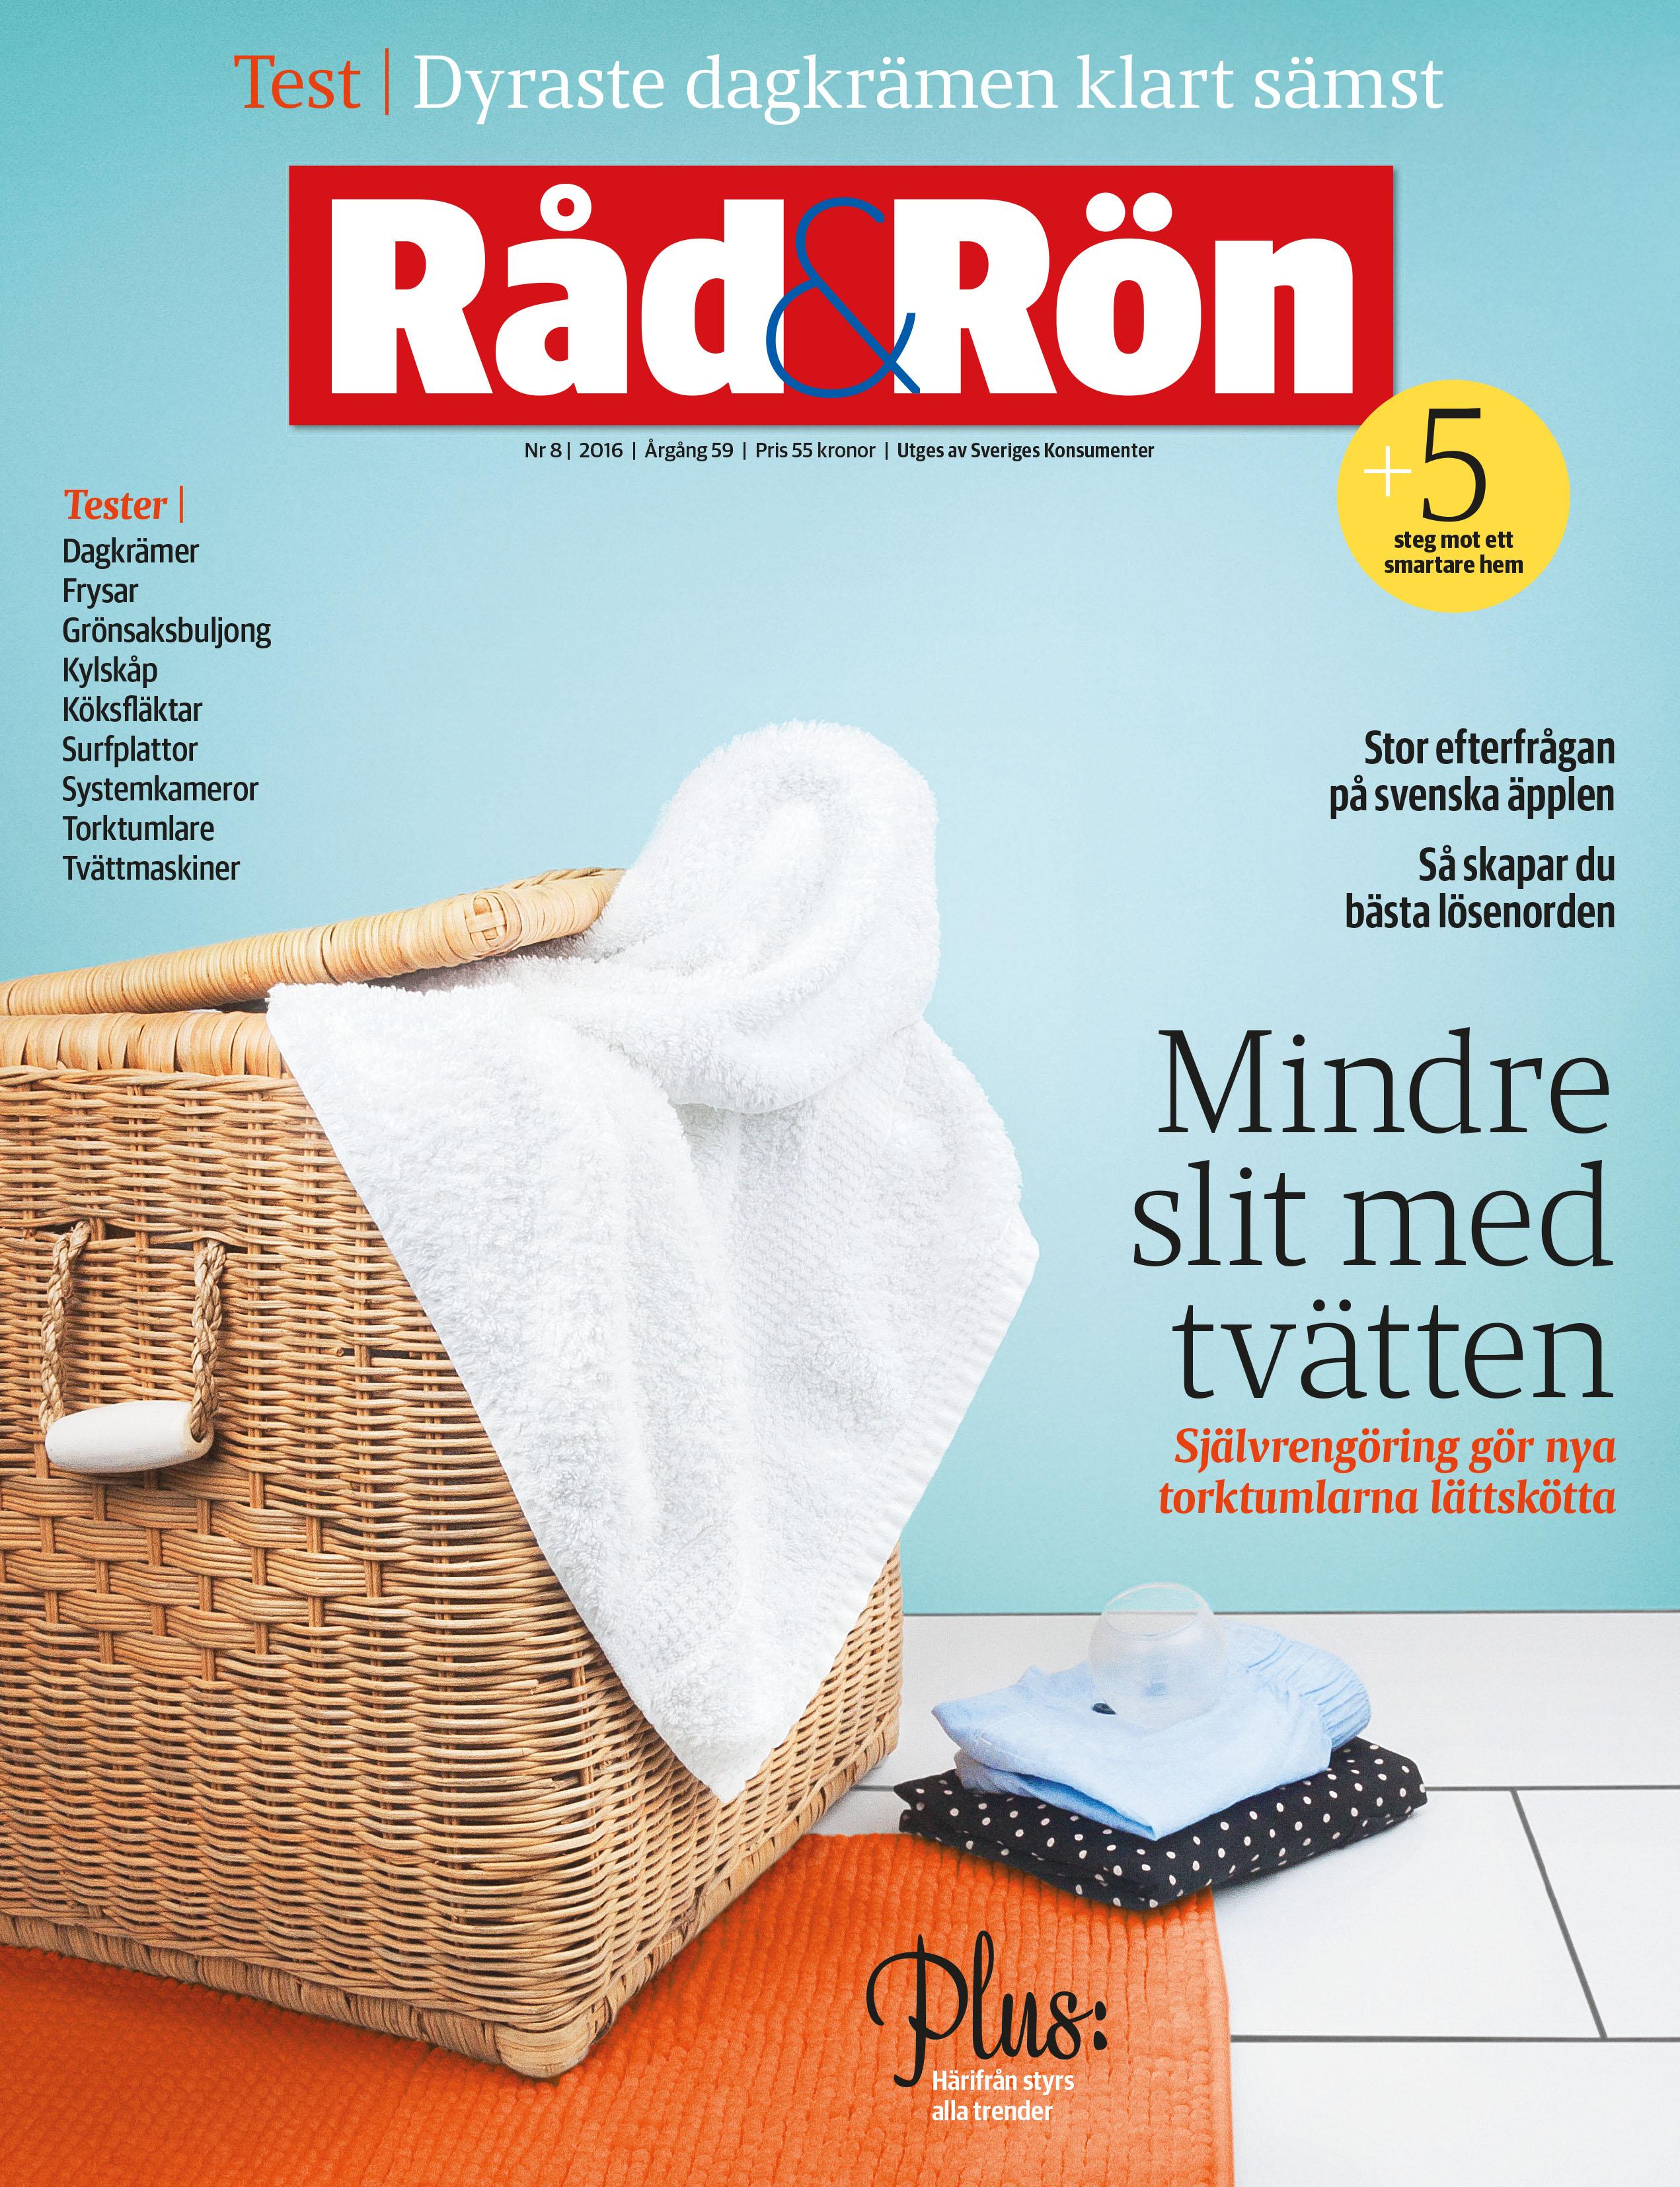 Råd & Rön 2016 Råd & Rön